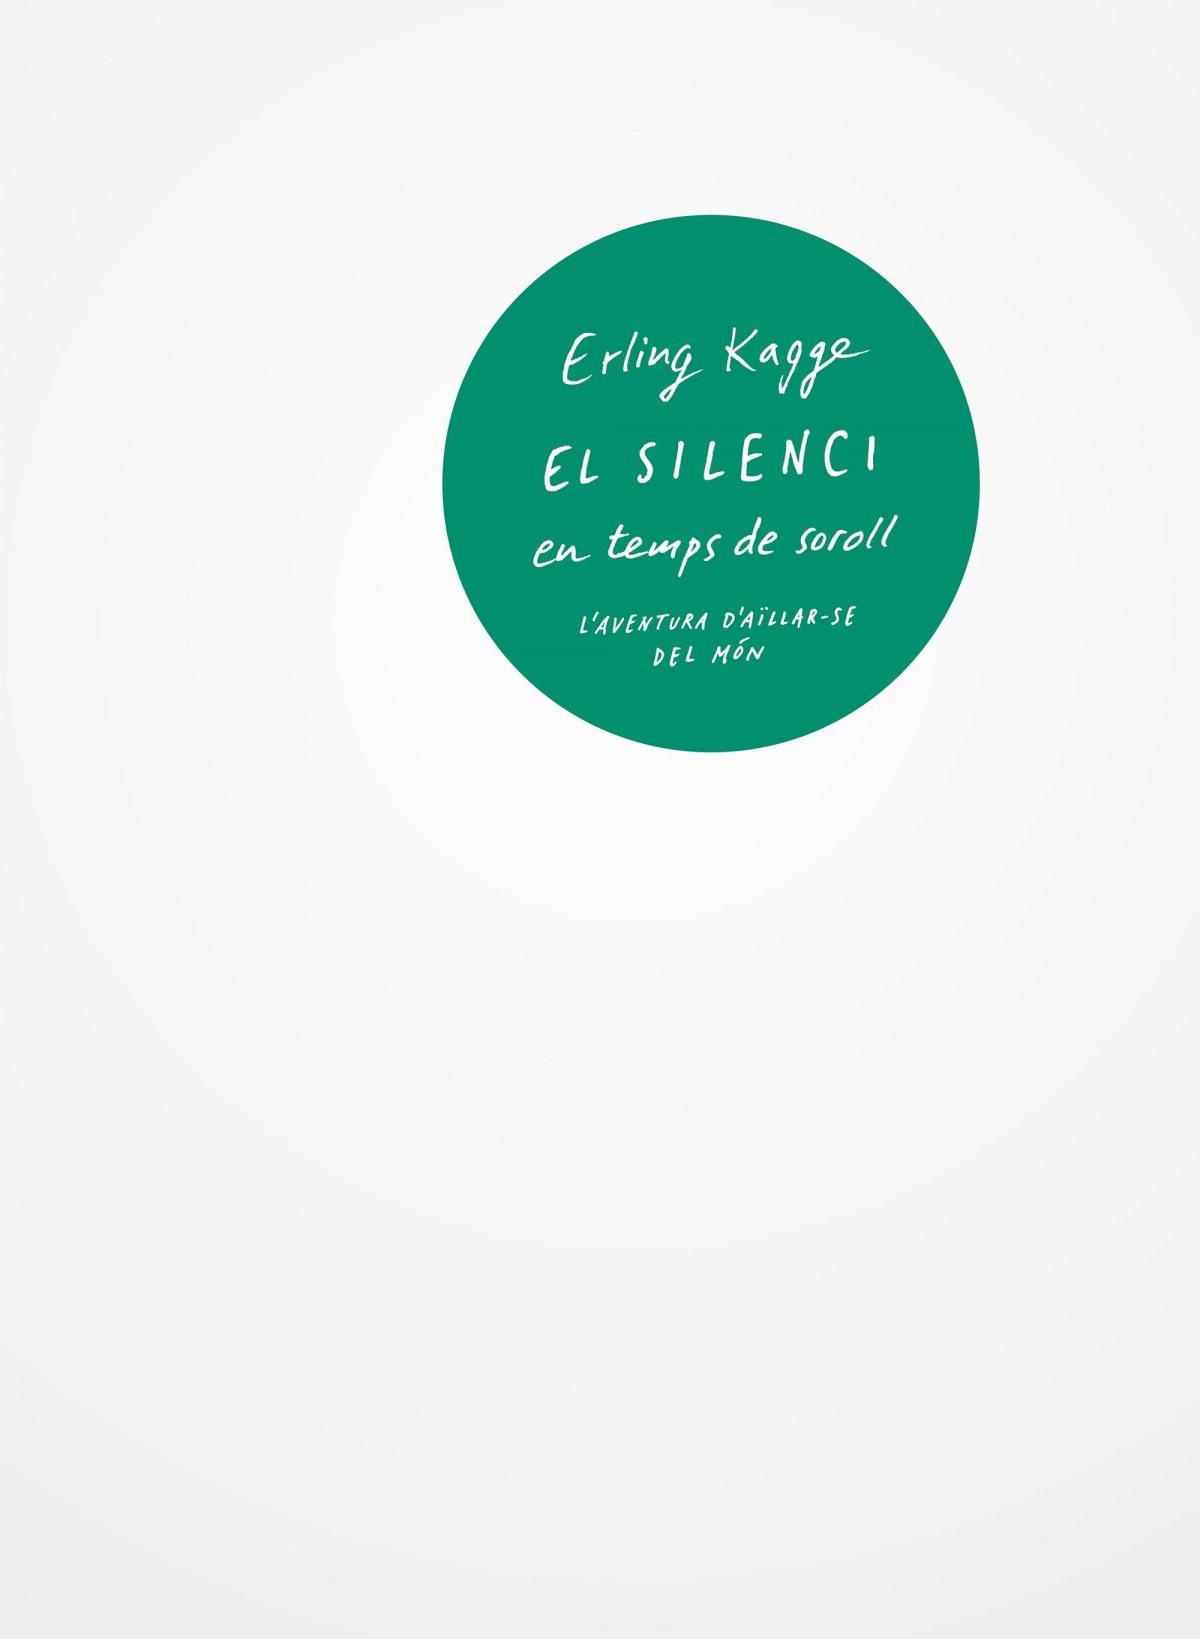 EL SILENCI EN TEMPS DE SOROLL 9788429776157